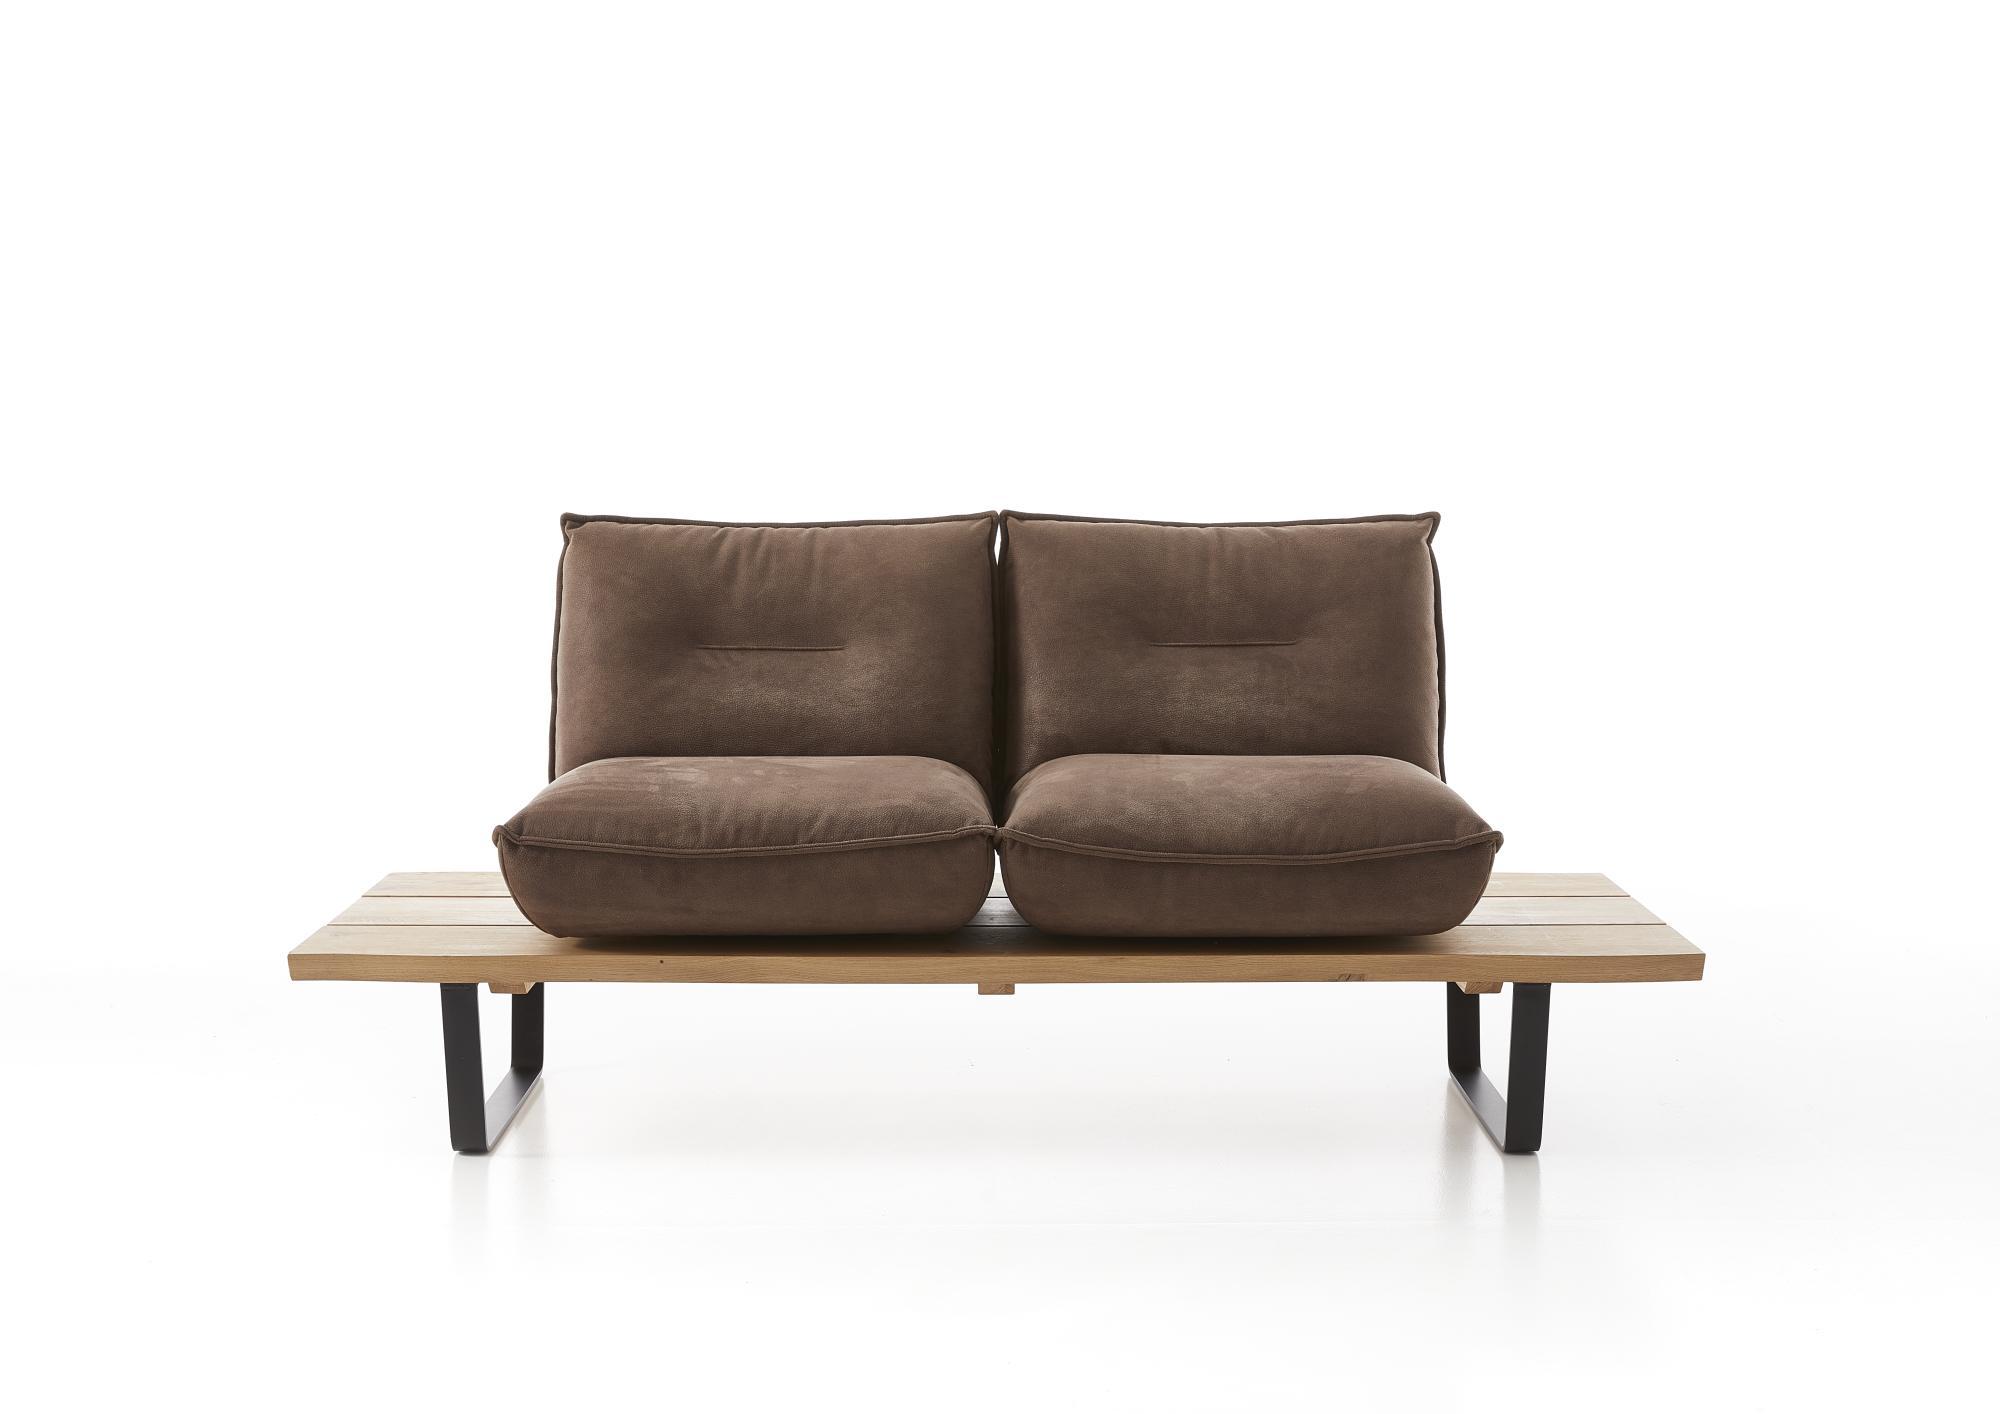 Full Size of Mondo Sofa Kaufen Softline Bed Couch Leder Brick Group 1 Agata Meble Bertinoro Orari Capocolle Mbel Martin Sitzbank 2 Sitzig Floro Online 3 Sitzer Cognac Sofa Mondo Sofa